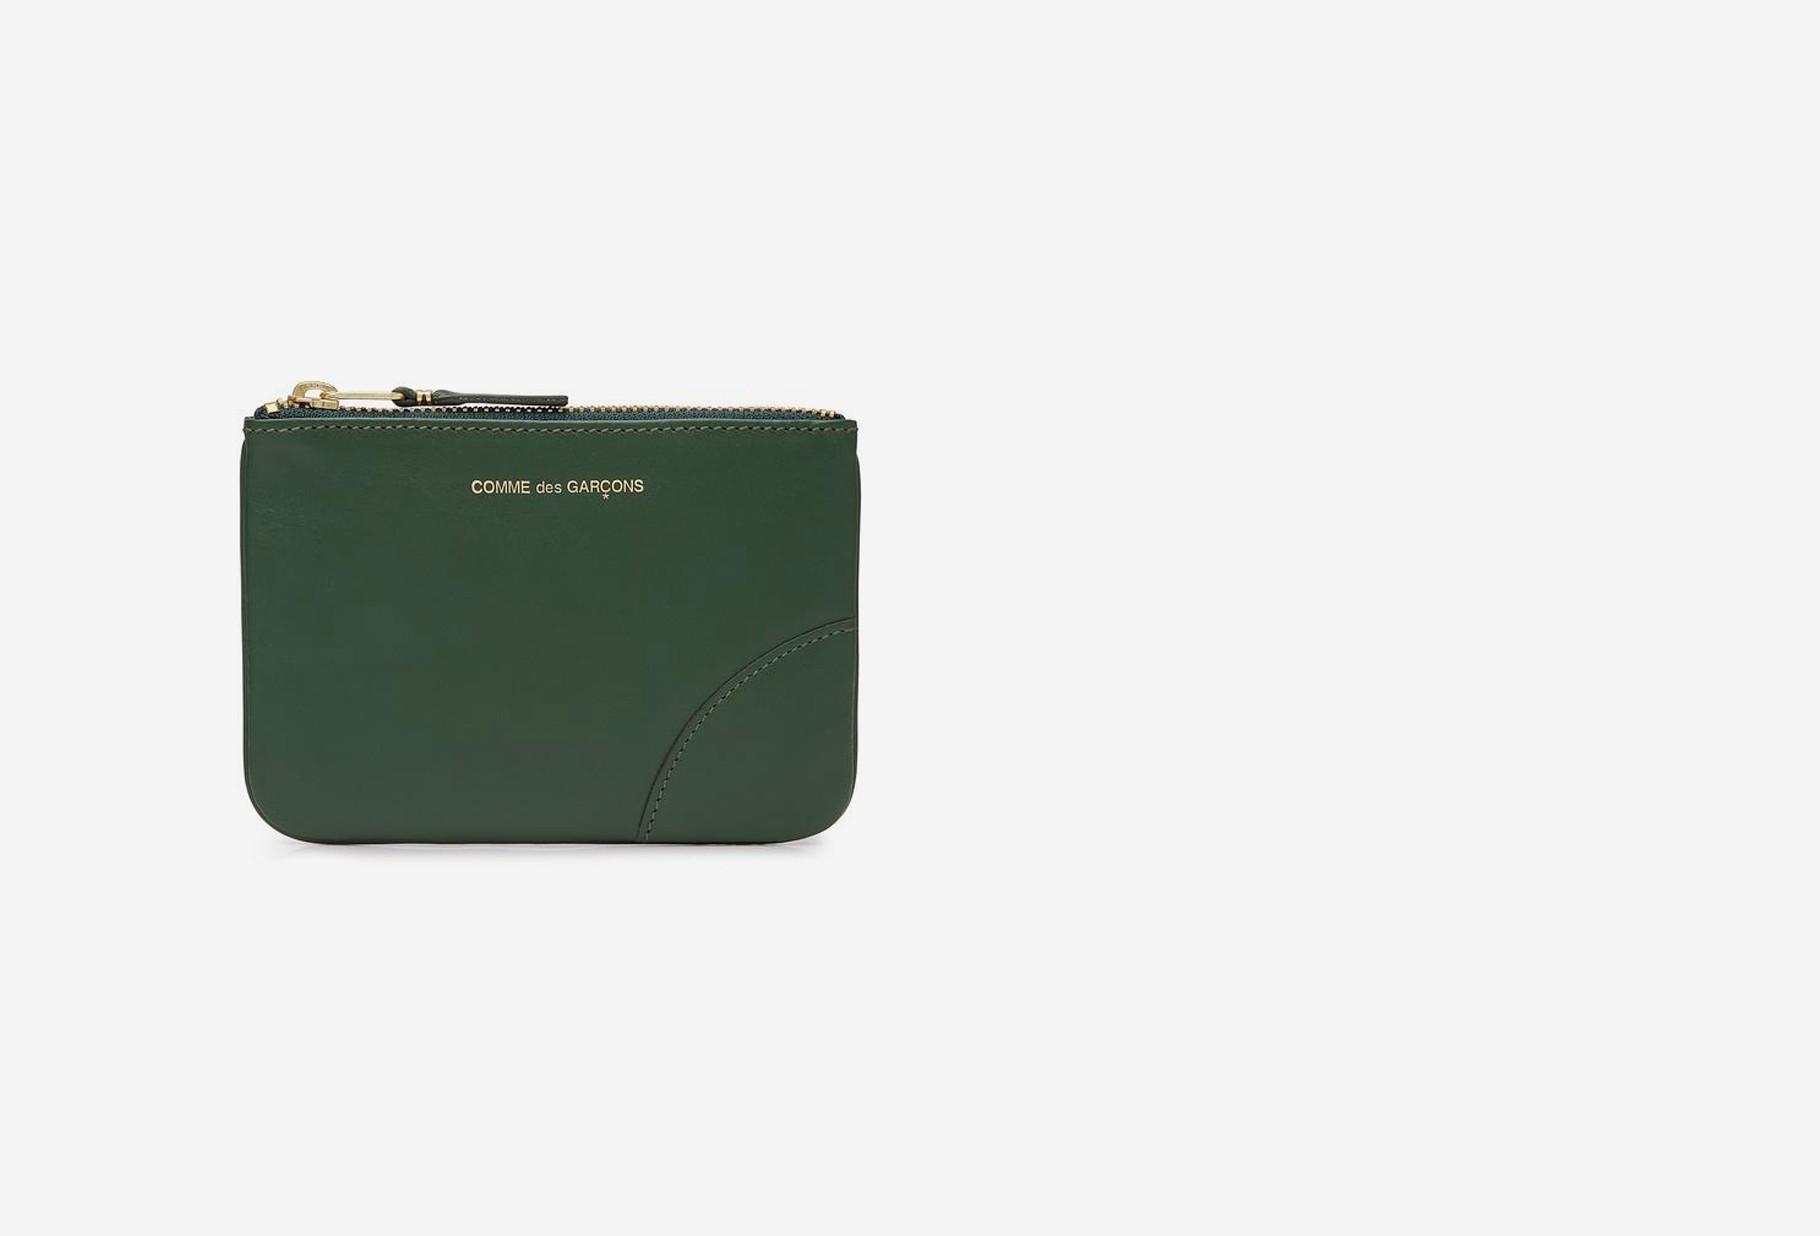 COMME DES GARÇONS WALLETS / Cdg leather wallet classic Sa8100 bottle green